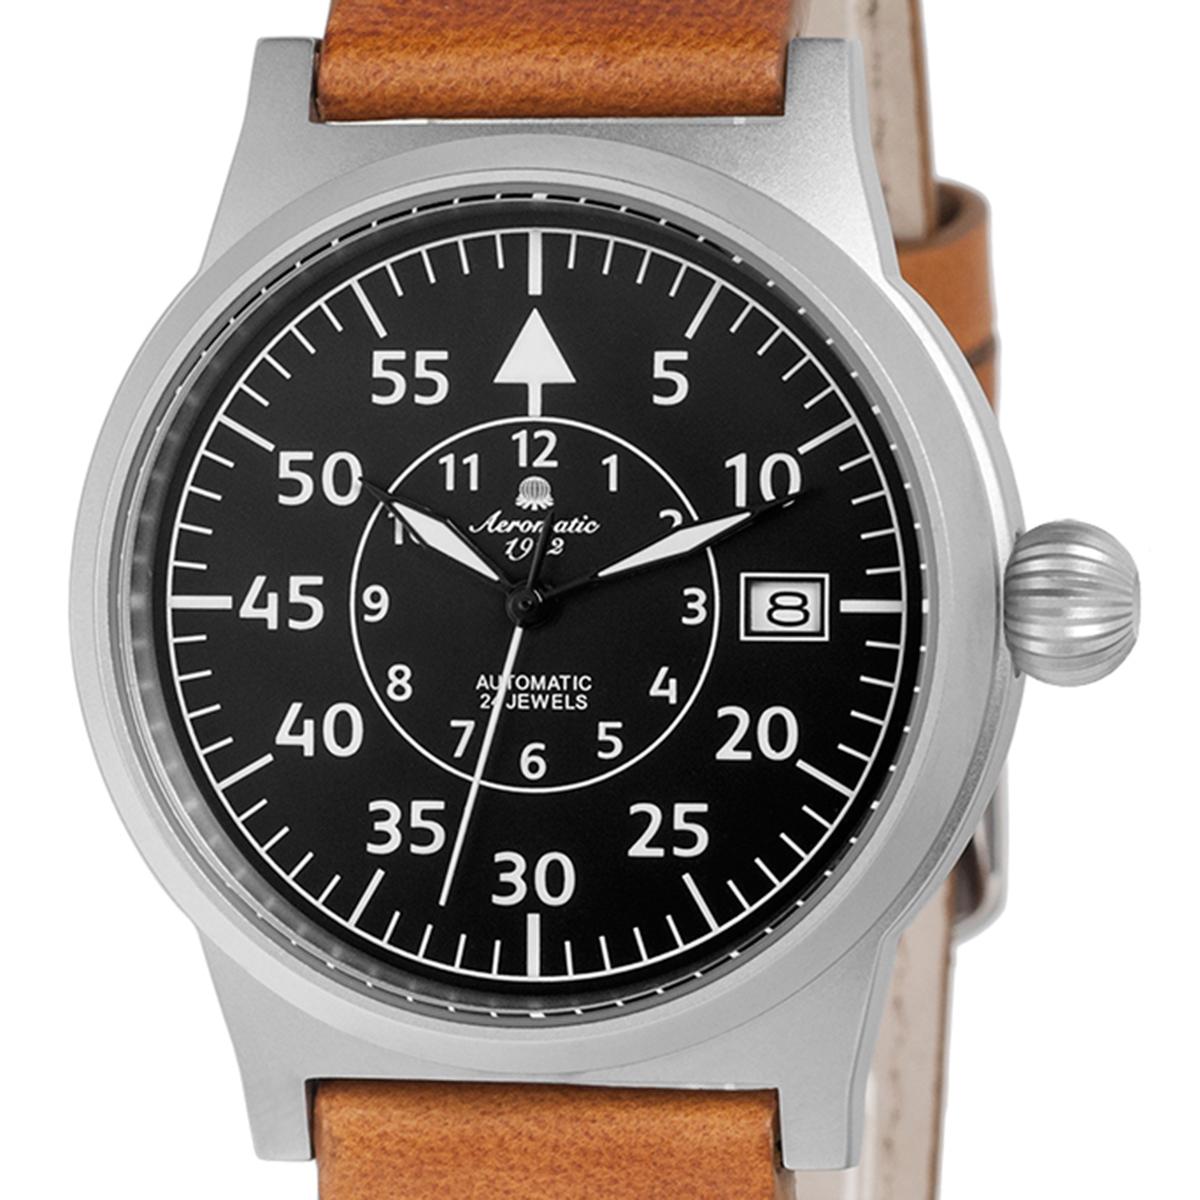 Aeromatic1912 エアロマティック1912 自動巻き(手巻き機能あり) 腕時計 [A1143X] 並行輸入品  デイト